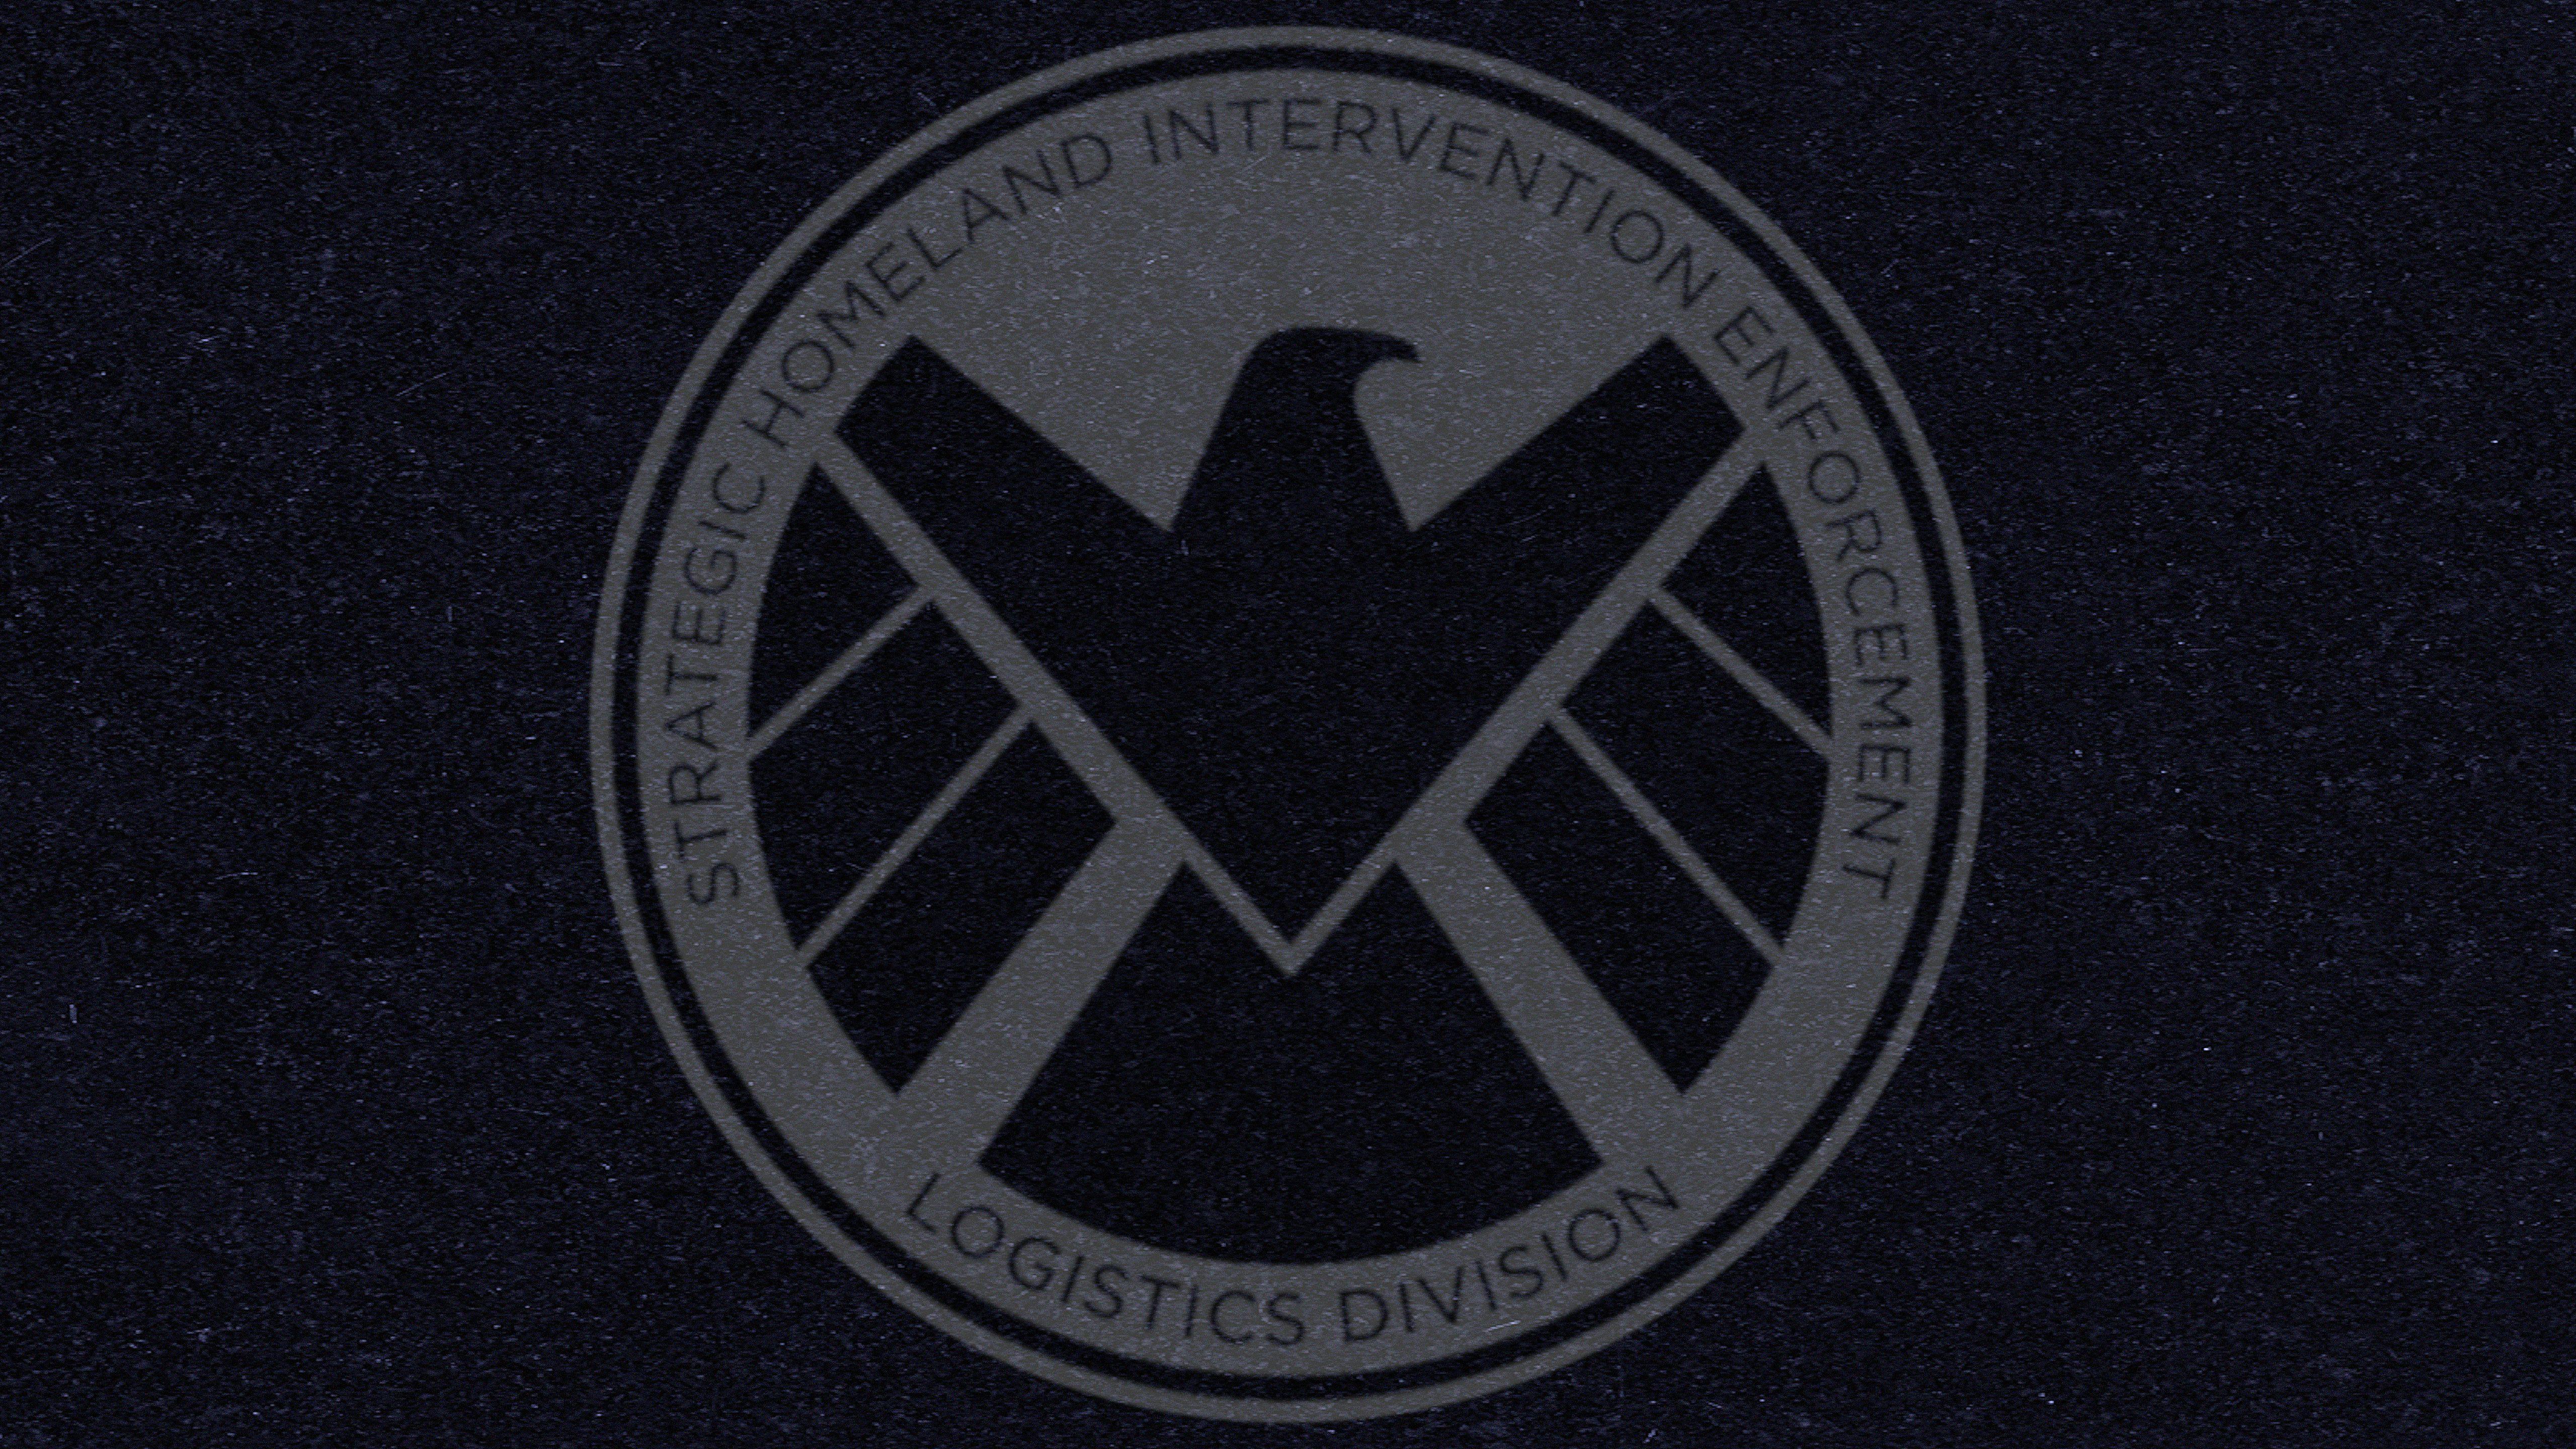 Agents of Shield wallpaper 9 5120x2880